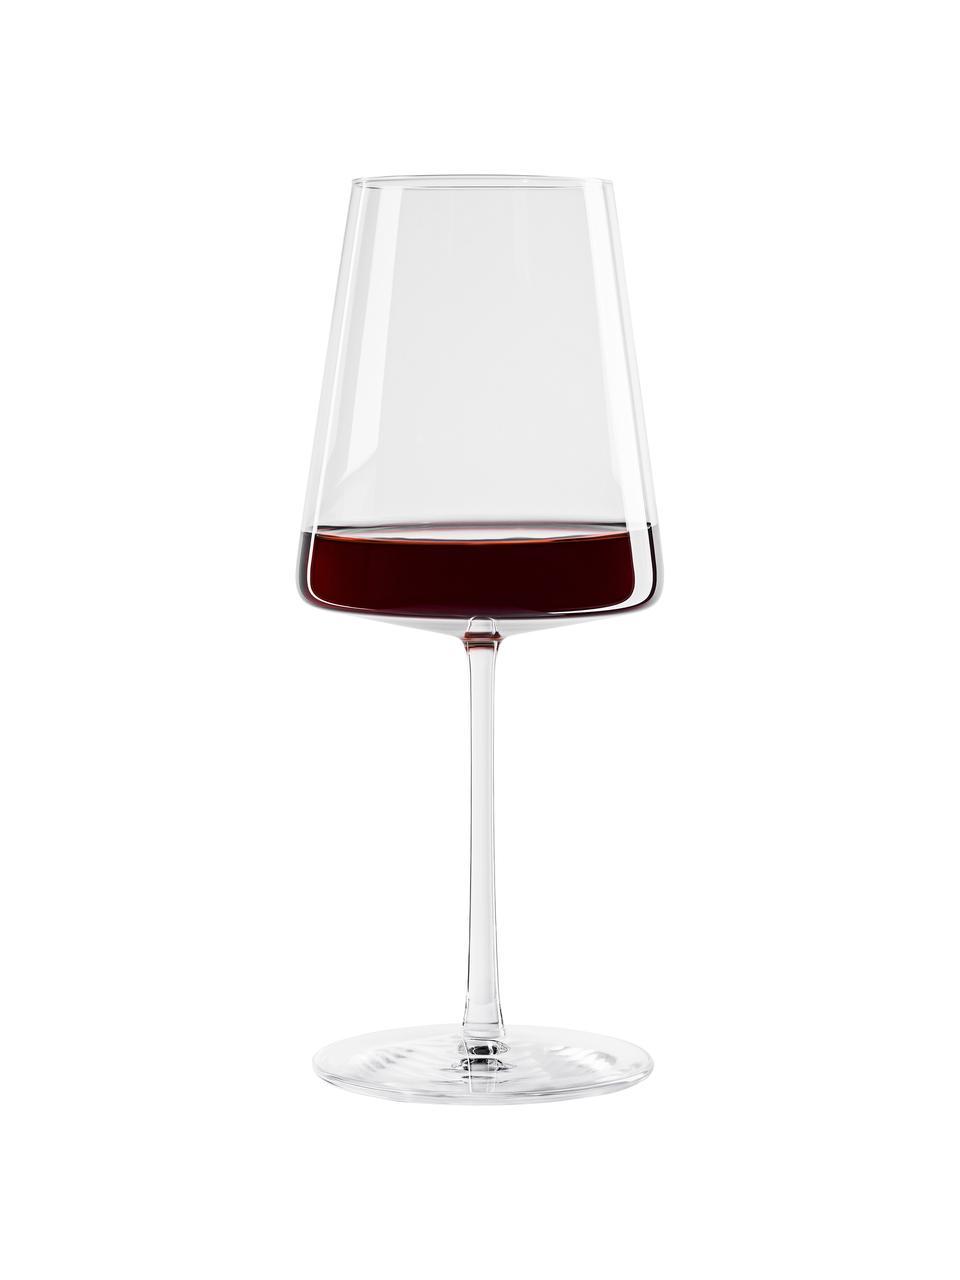 Kristallen rode wijnglazen Power, 6 stuks, Kristalglas, Transparant, Ø 9 x H 23 cm